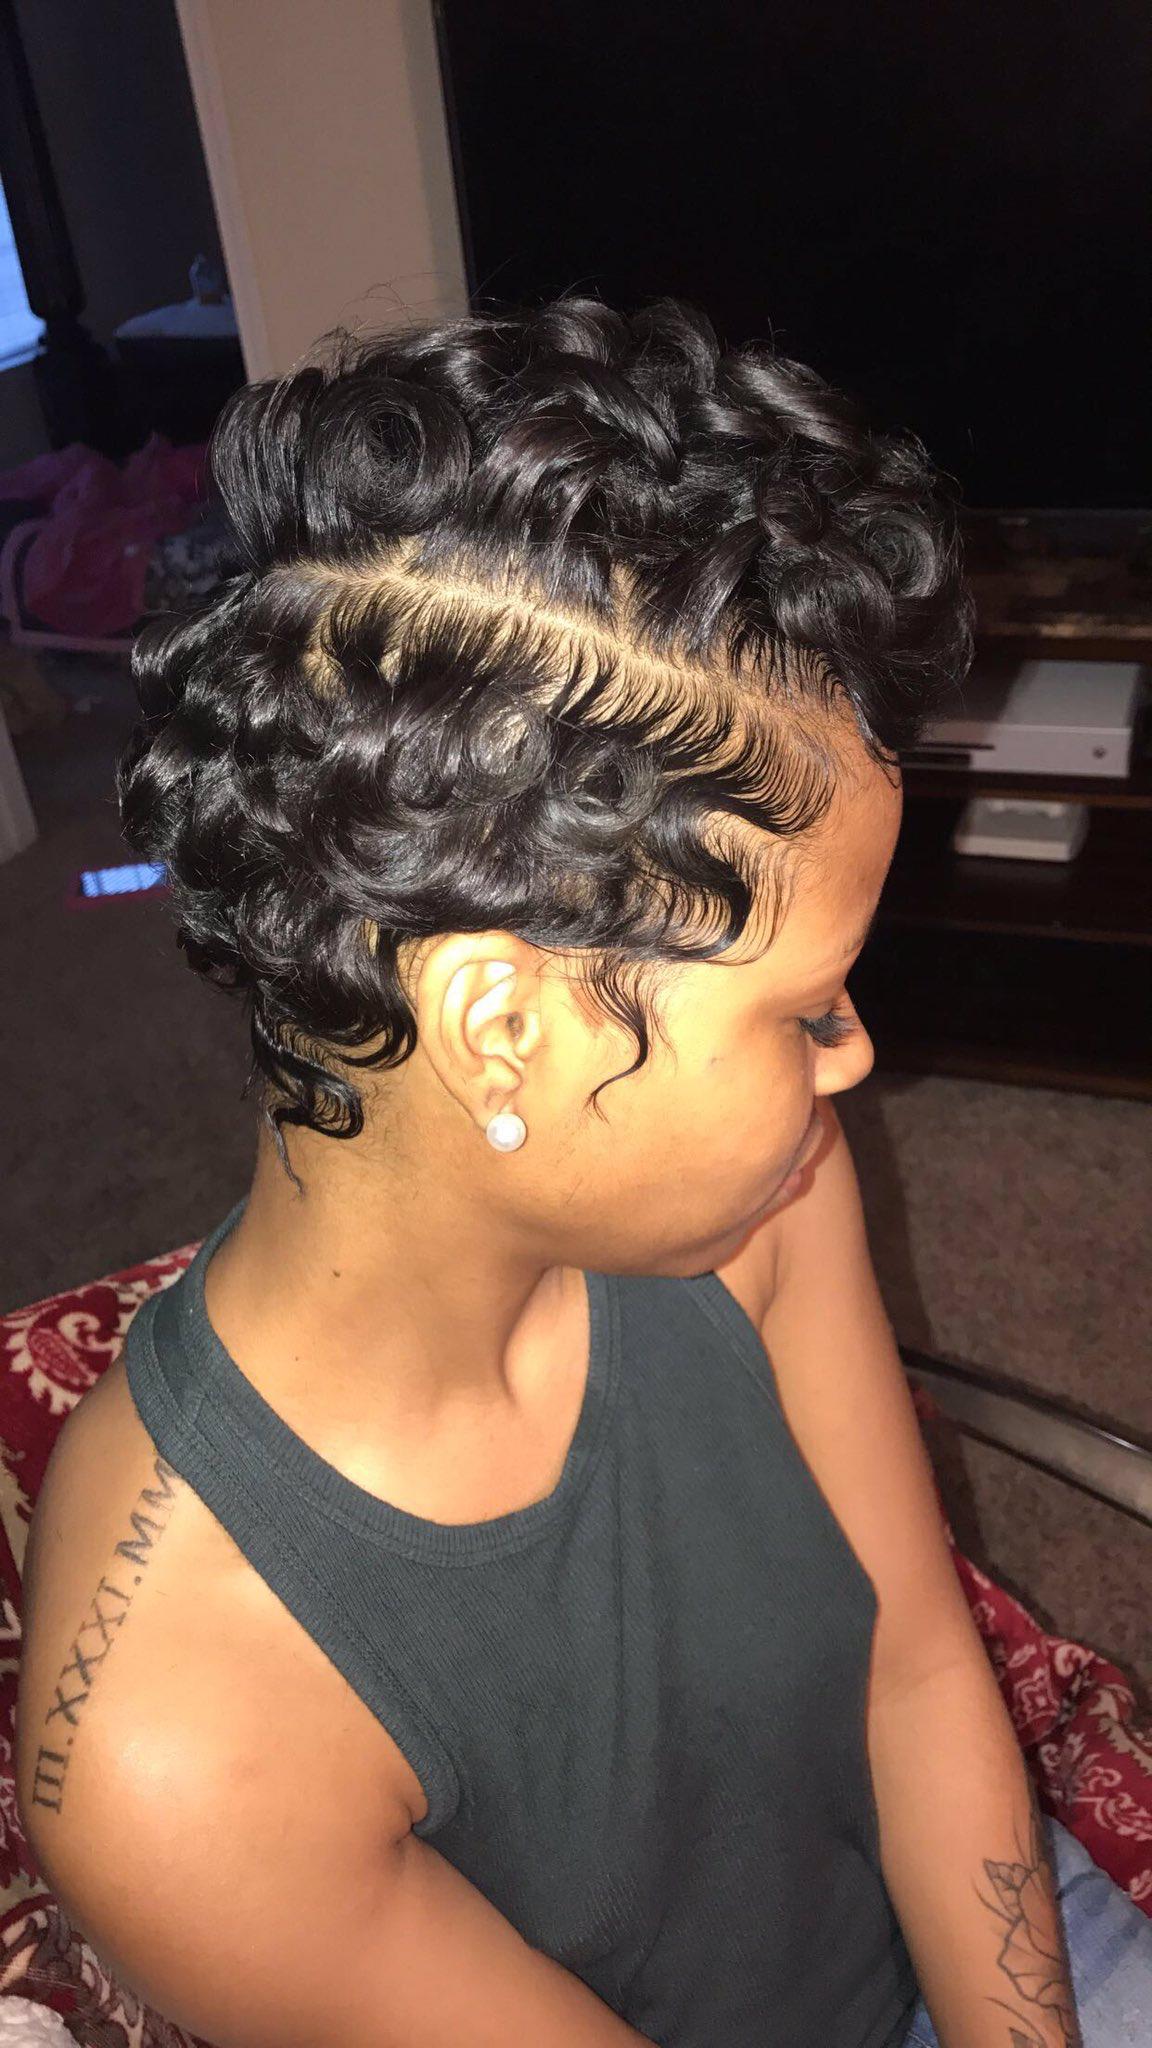 11+ stupefying 10 year old girls hairstyles ideas   finger